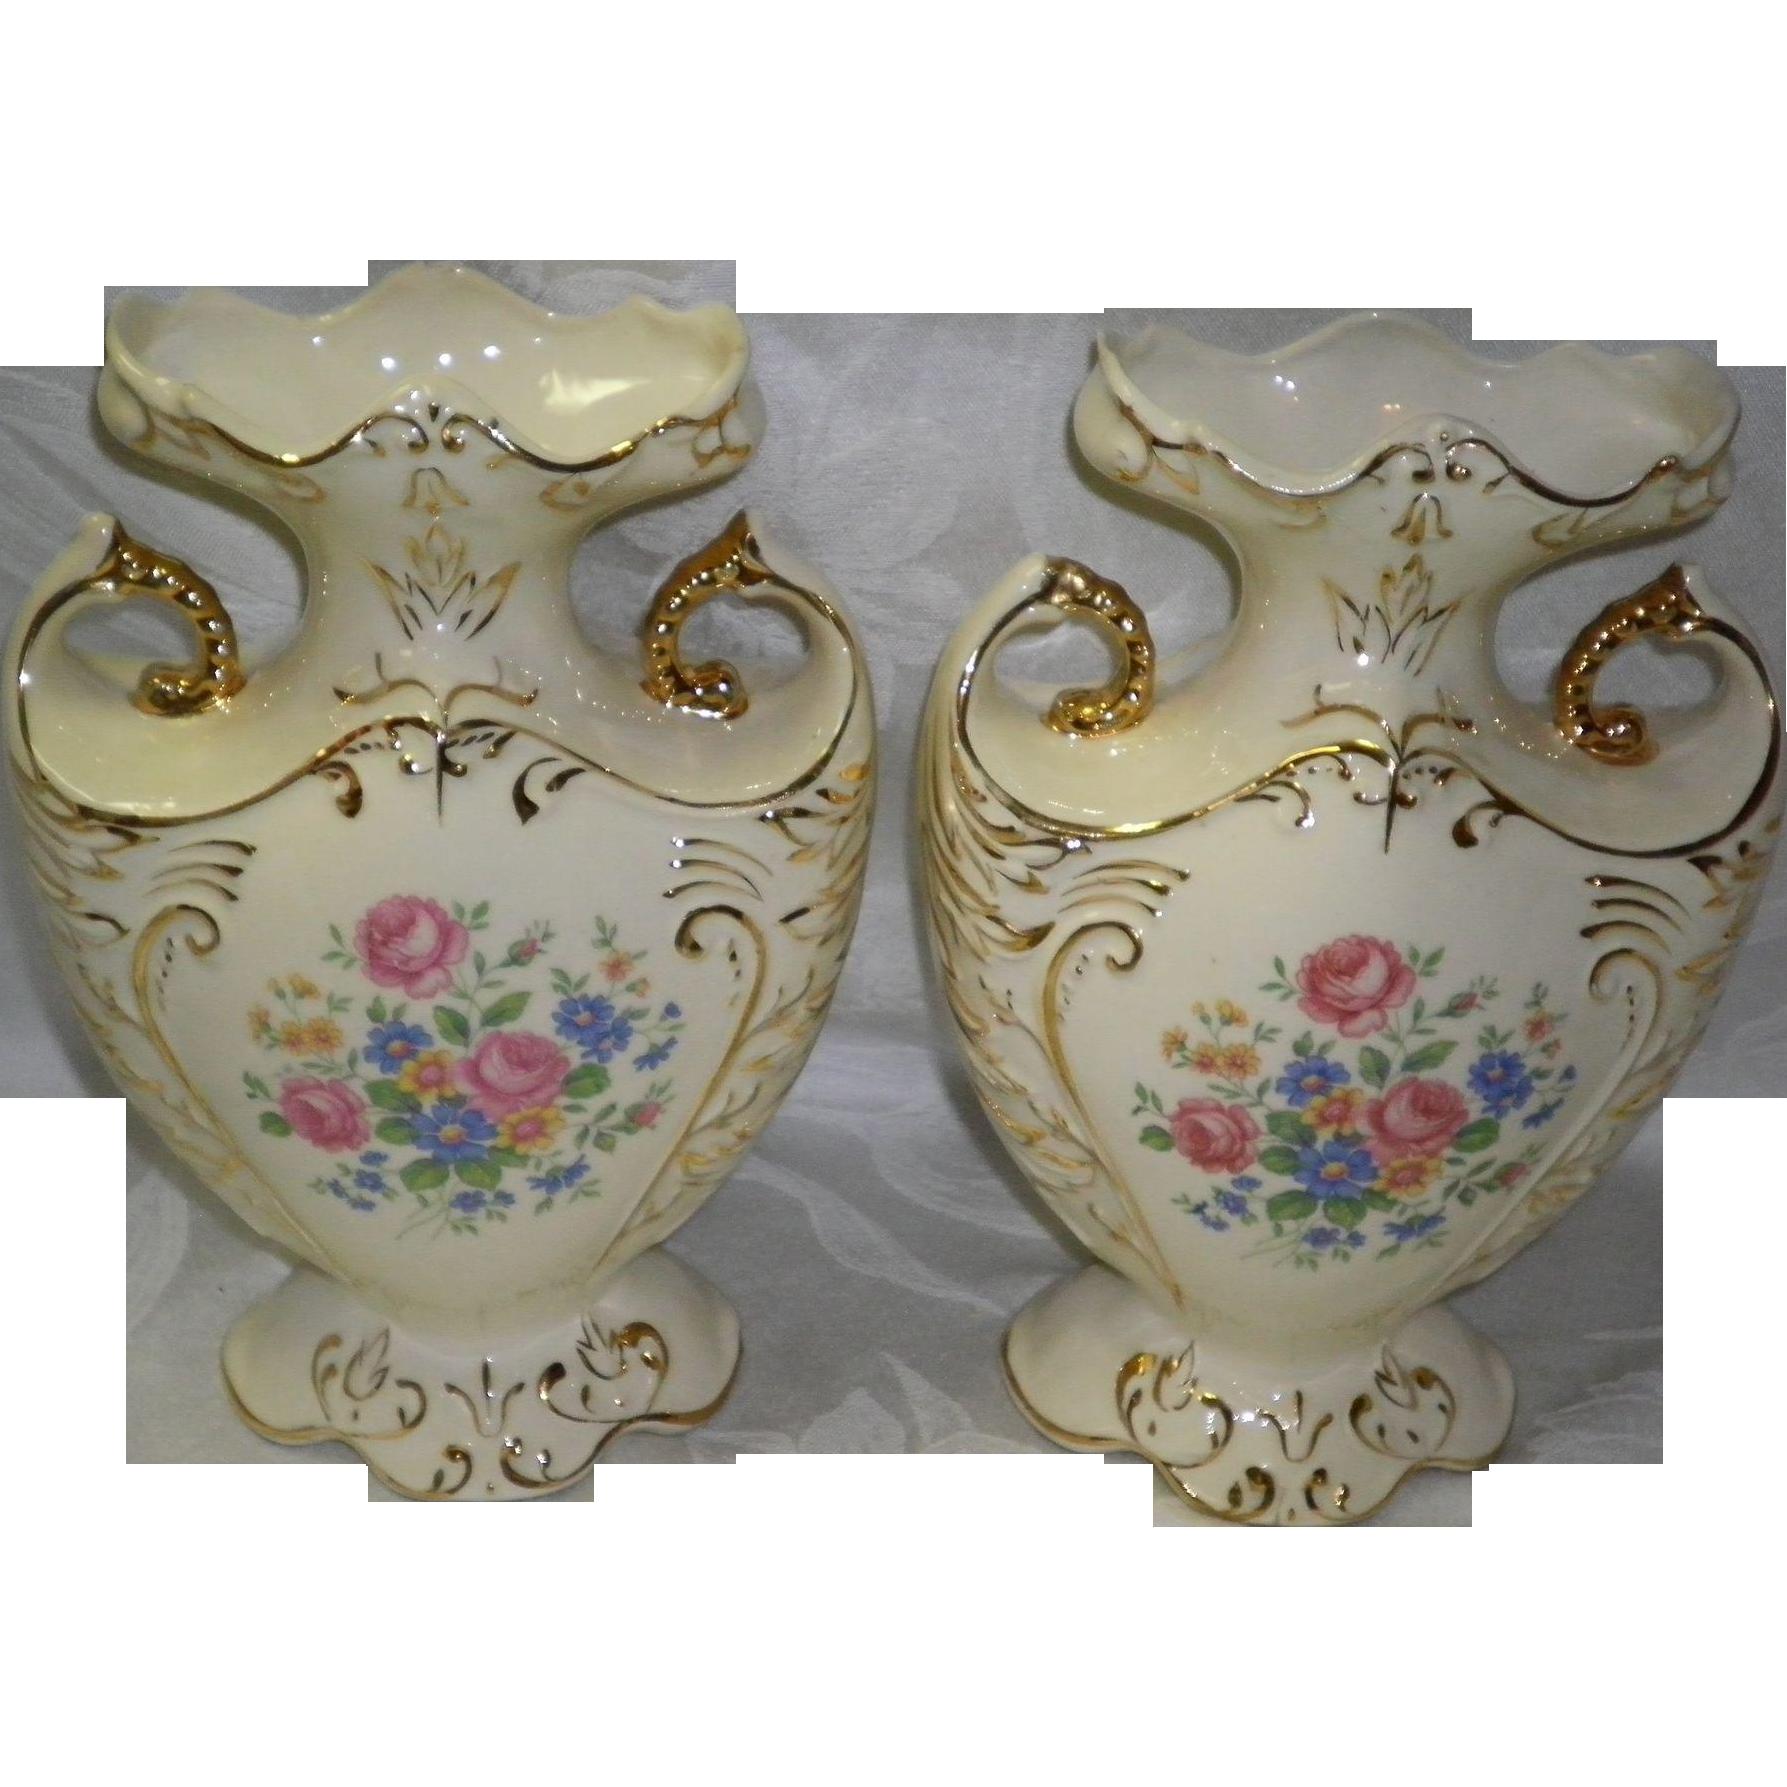 Set OF 2 Vintage Mantle Vases By Paul's Gifts